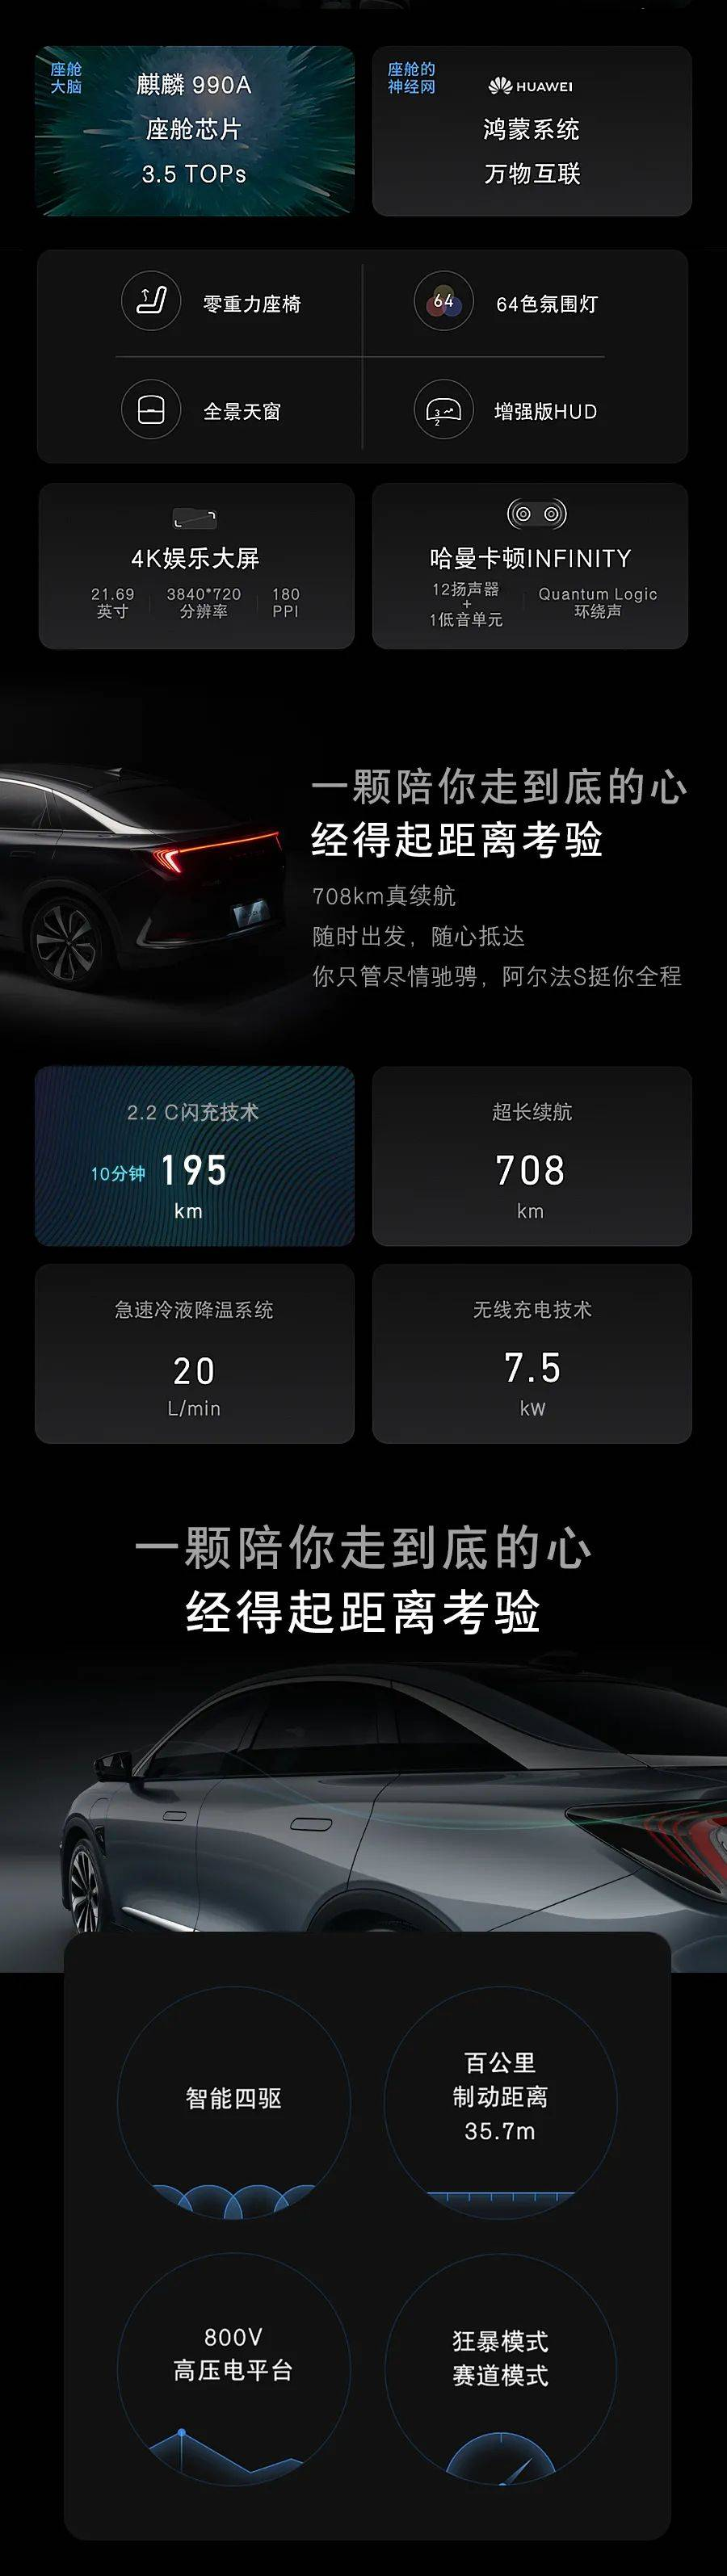 Huawei inside第一车令华为员工泪目:背后是数不清的英雄的照片 - 5